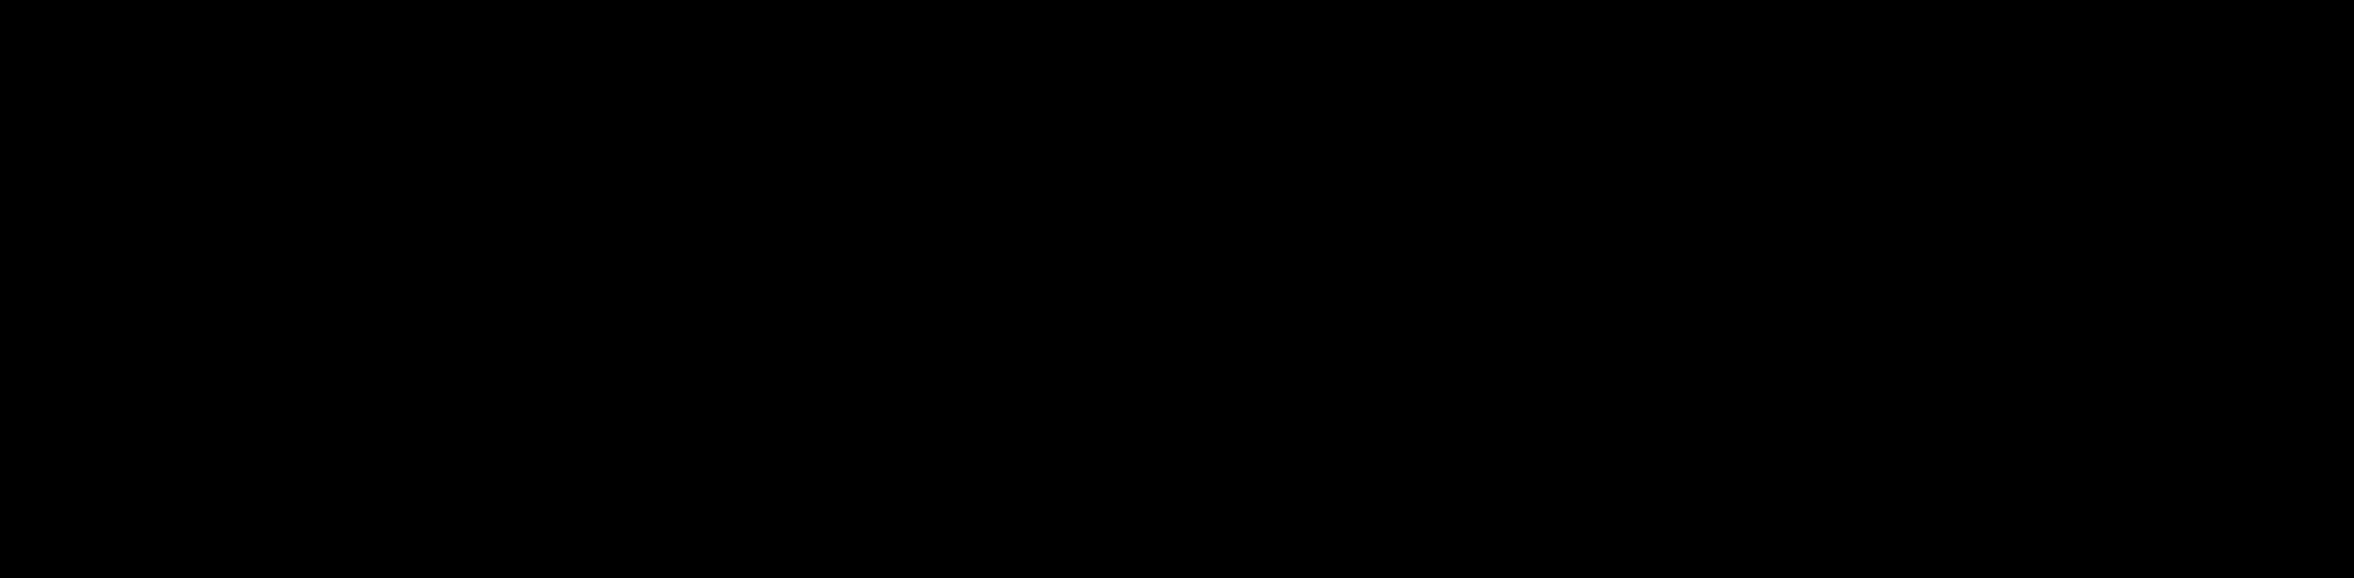 Divider by gdj on. Flourish clipart fancy symbol